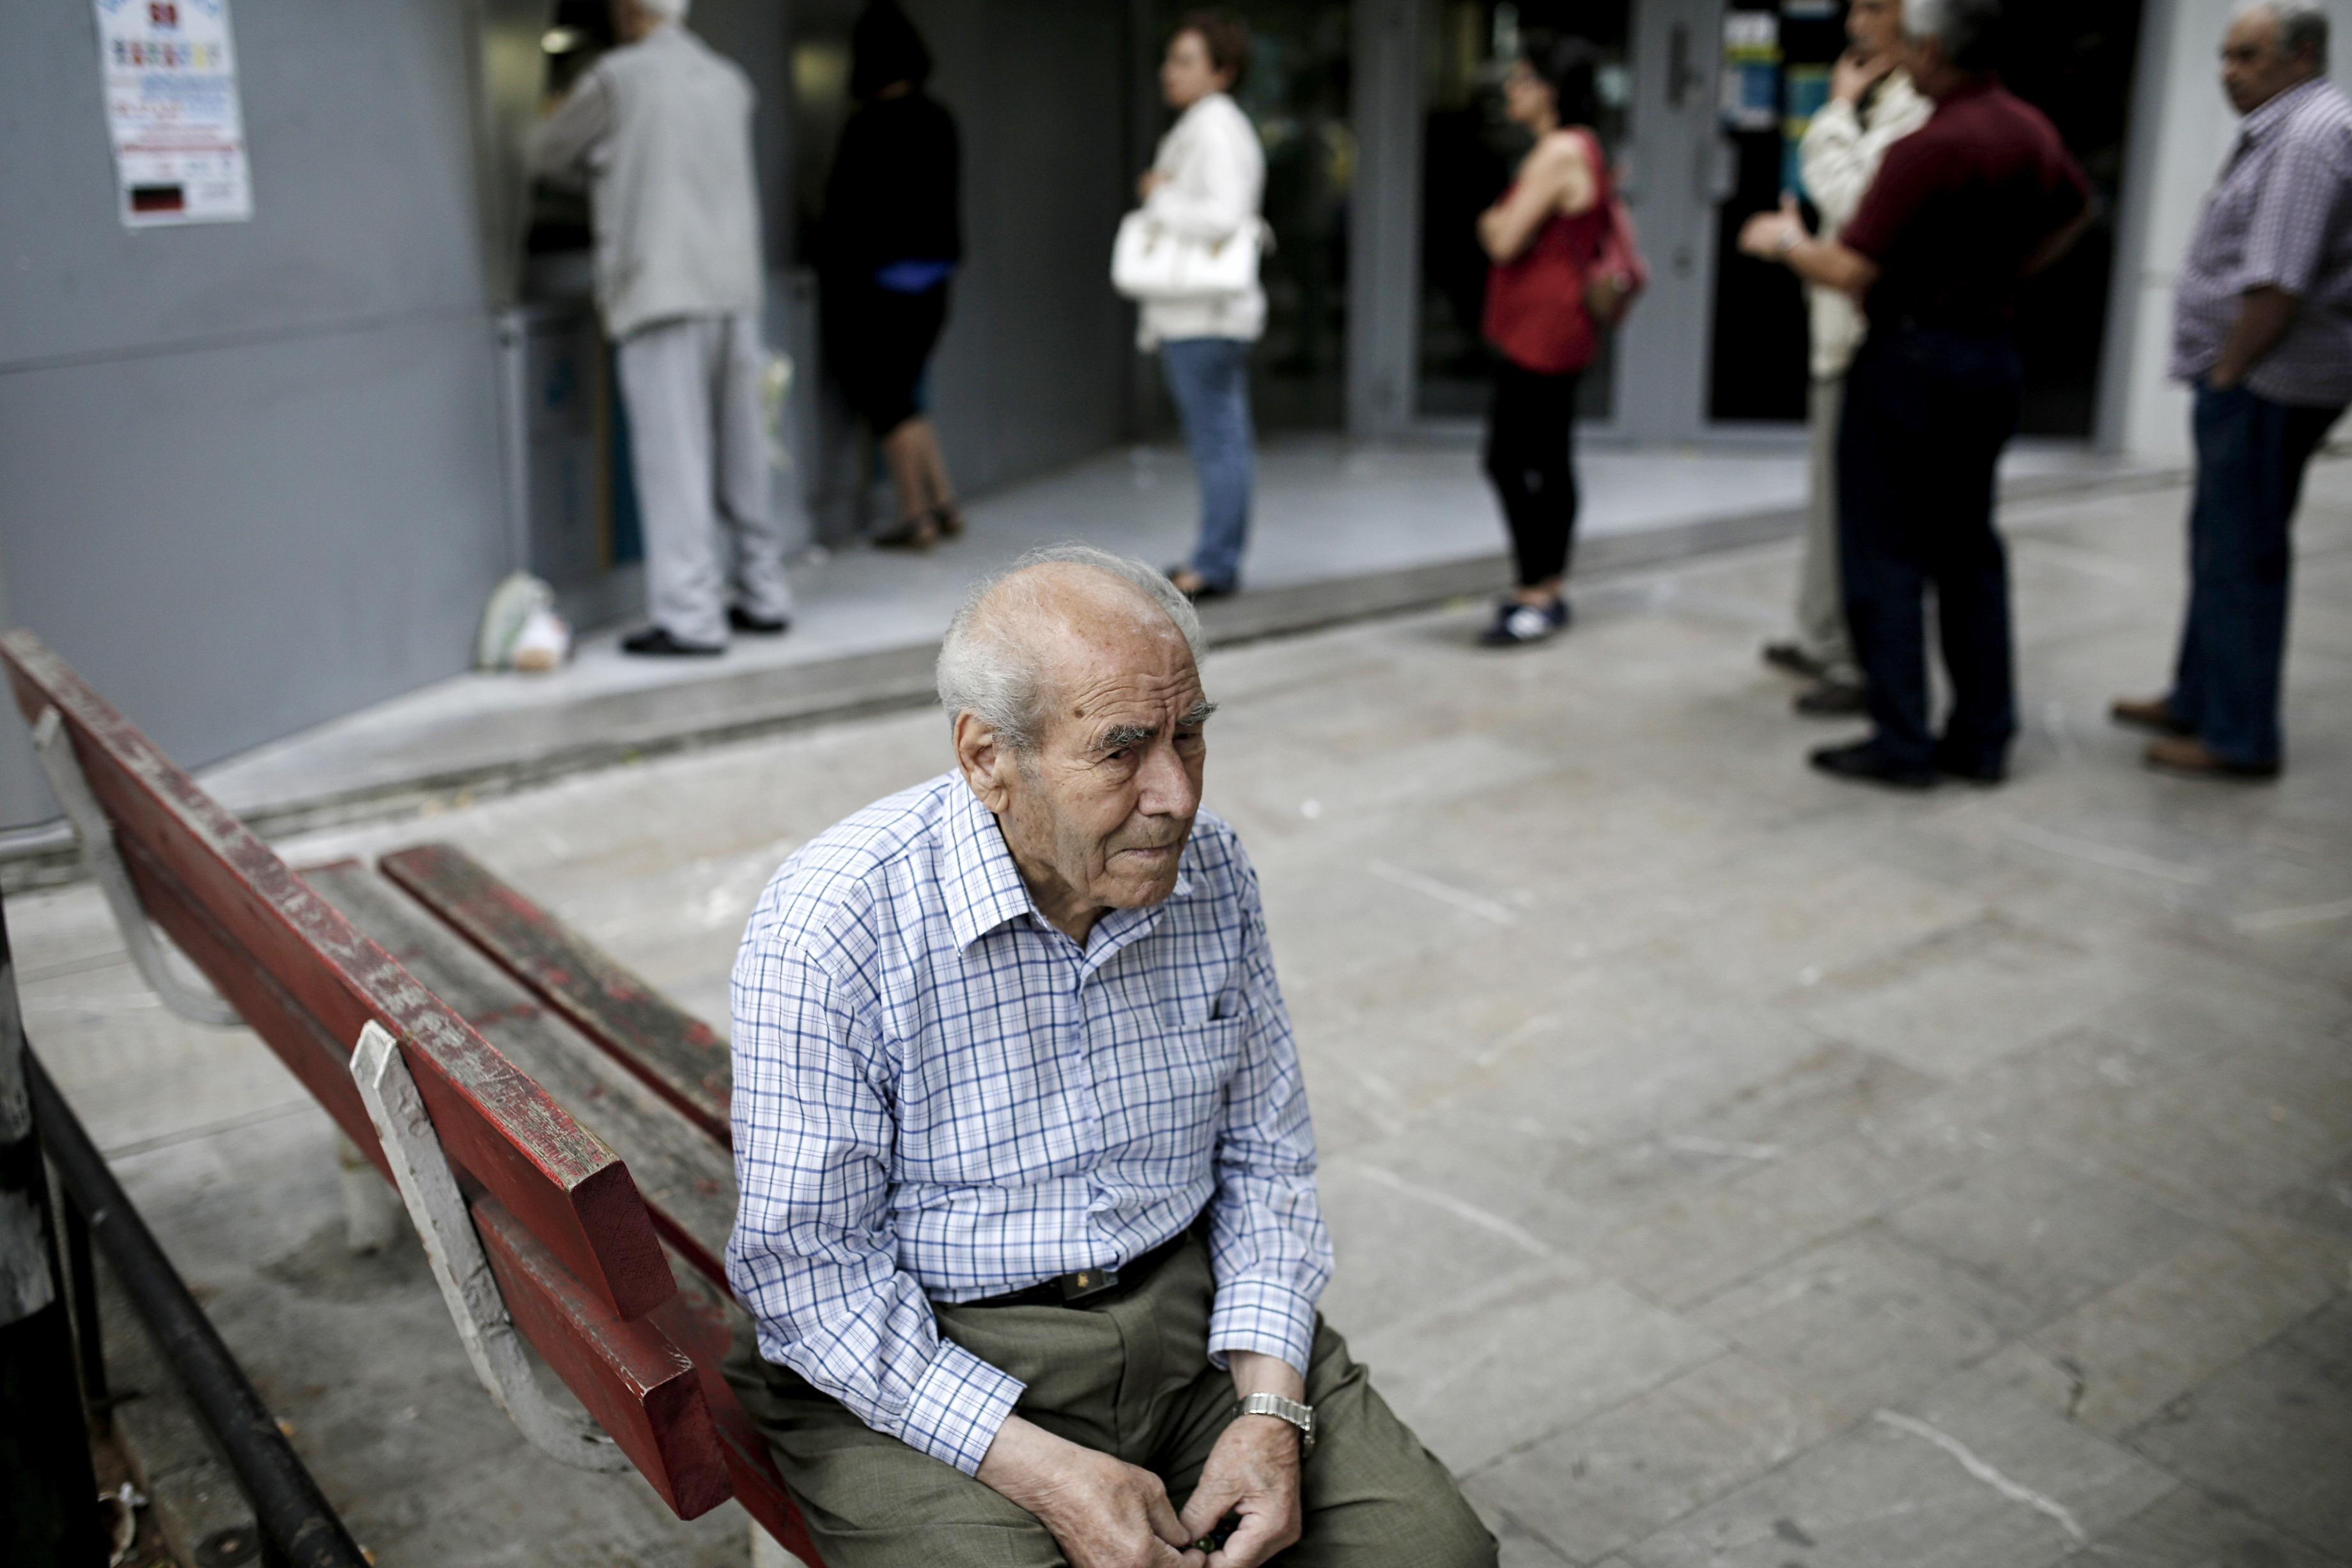 Watching Greece Developments As Tsipras Calls July 5 Referendum On Bailout Demands